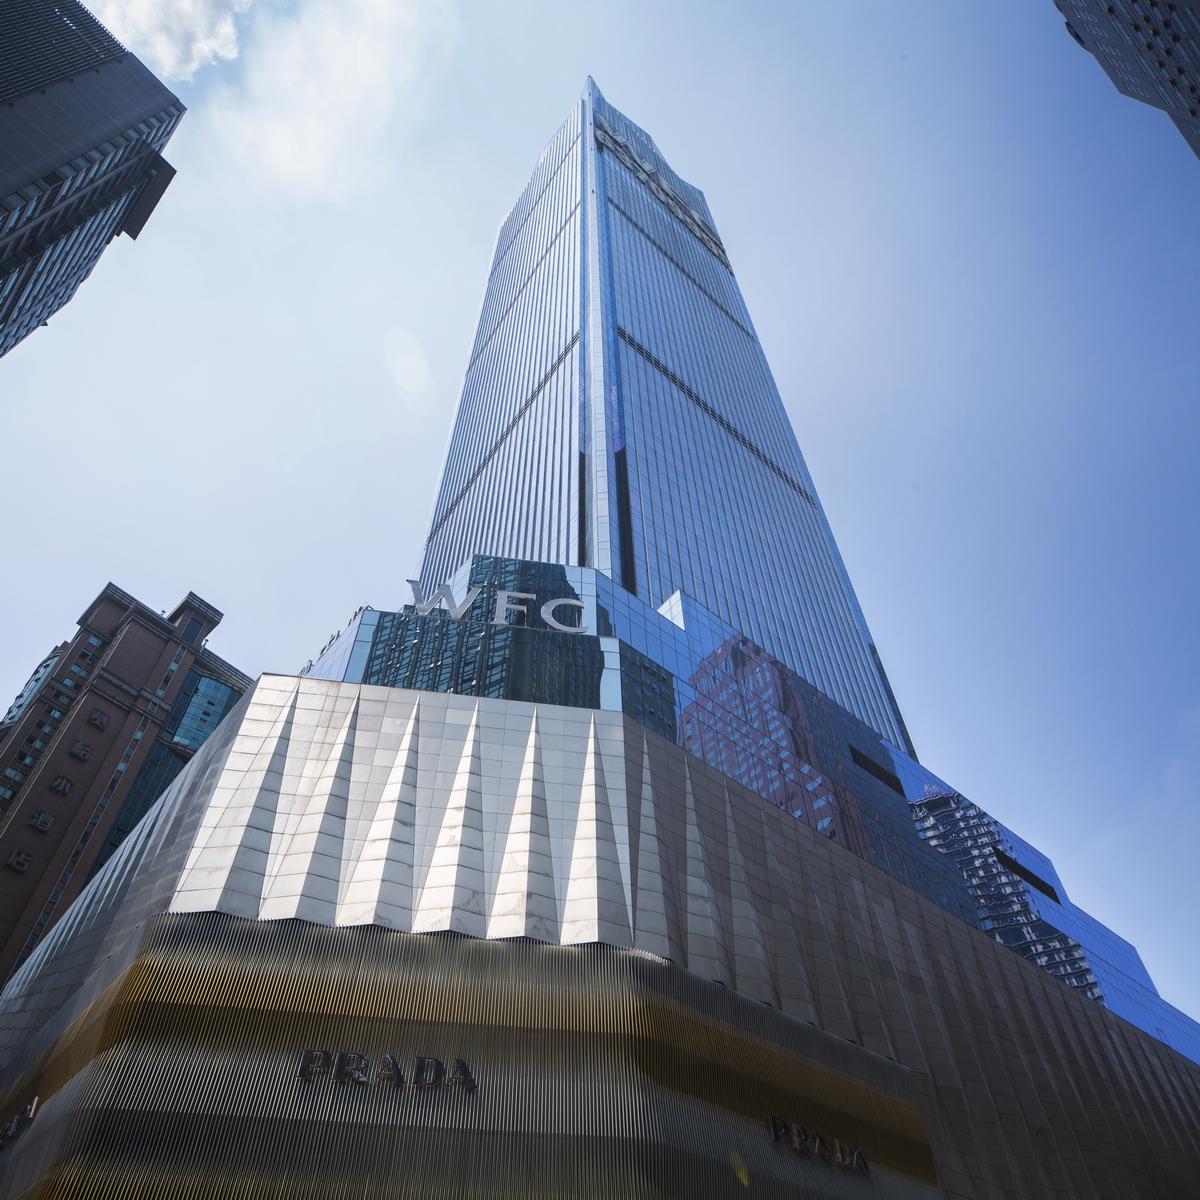 Chongqing World Financial Center